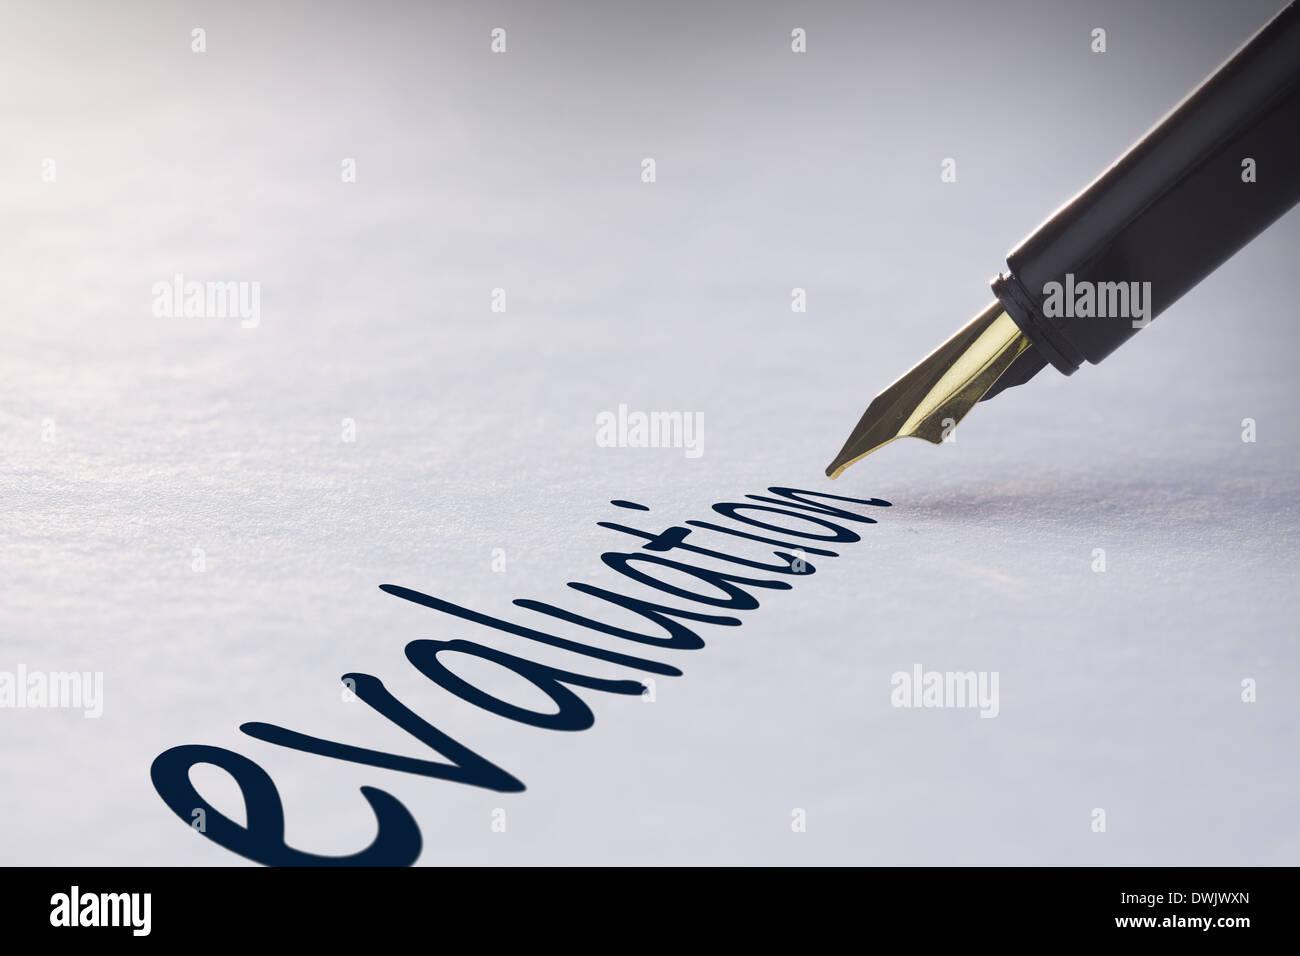 Fountain pen writing Evaluation - Stock Image